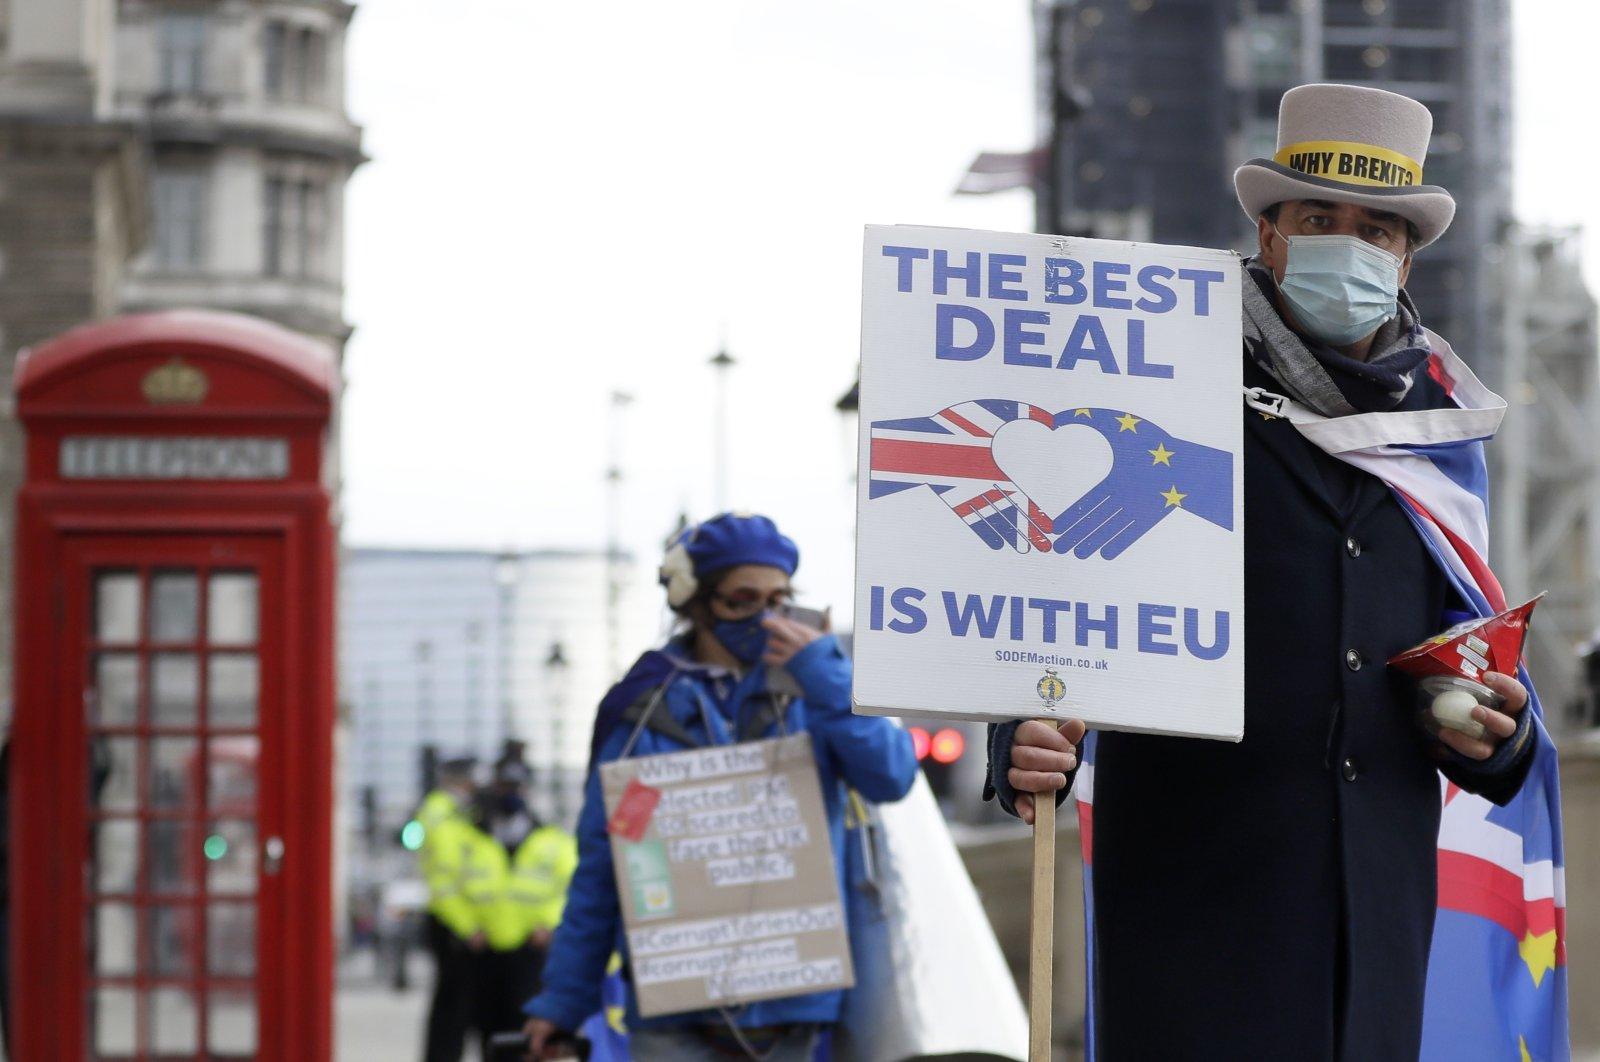 Steve Bray (R), a pro-EU campaigner, during a protest against a Brexit no-deal near Parliament in London, Nov. 25, 2020. (AP Photo)